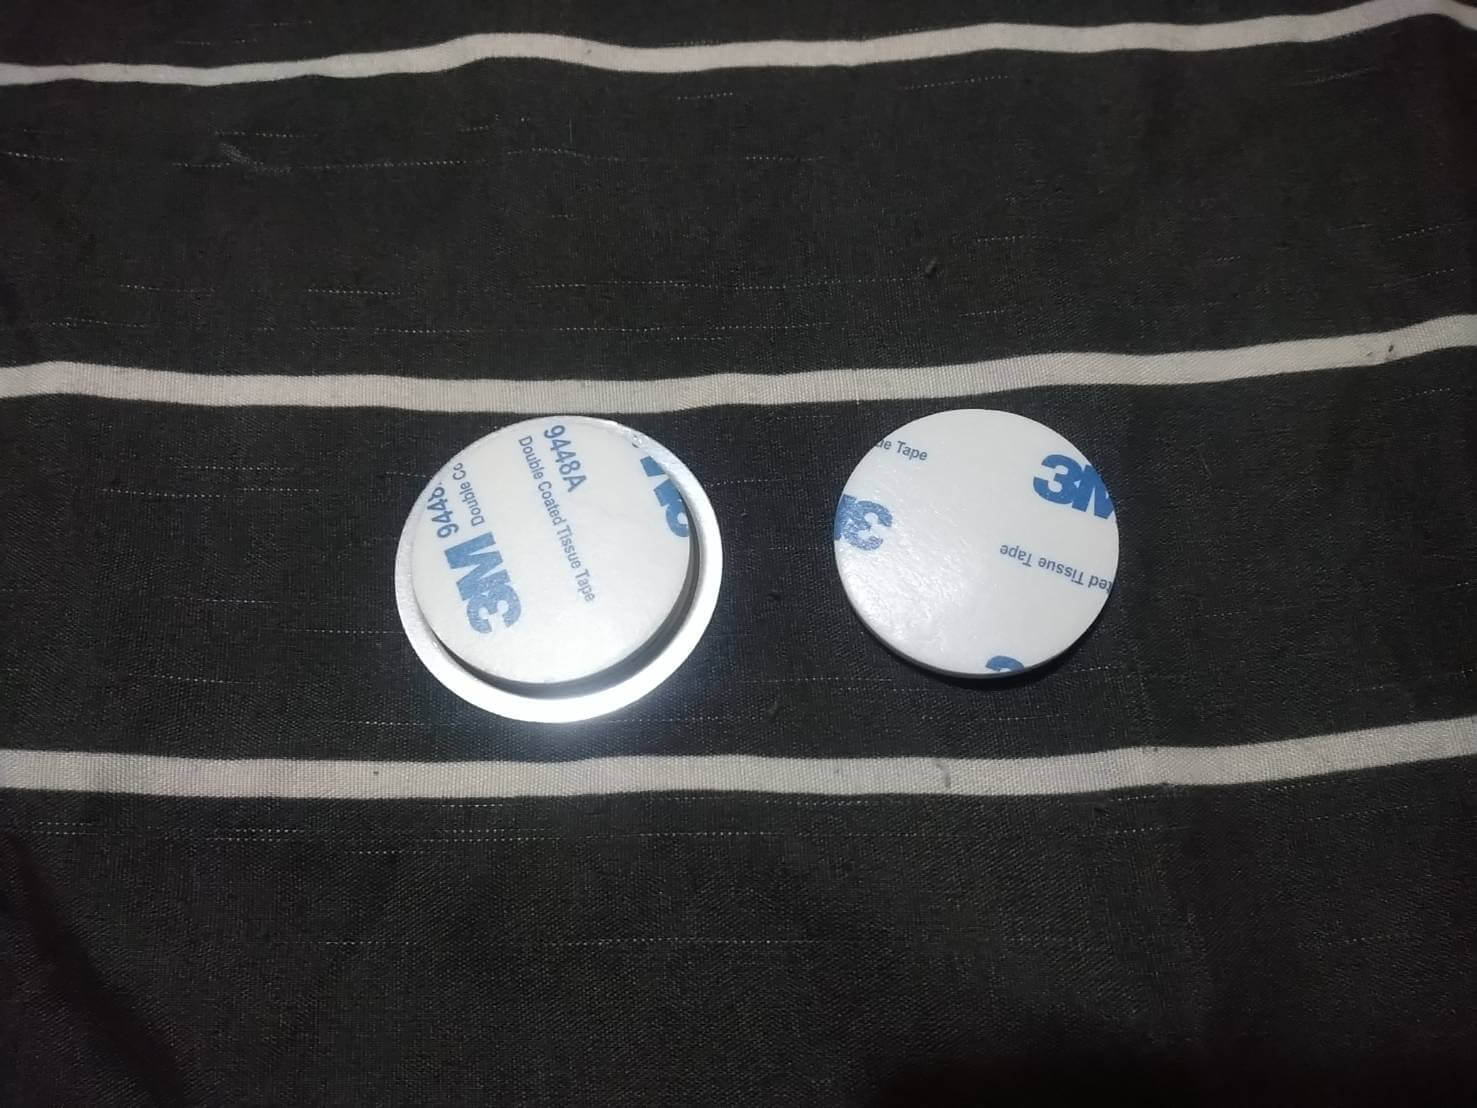 PETONEER-智能滅菌除臭機  鐵片 泡棉